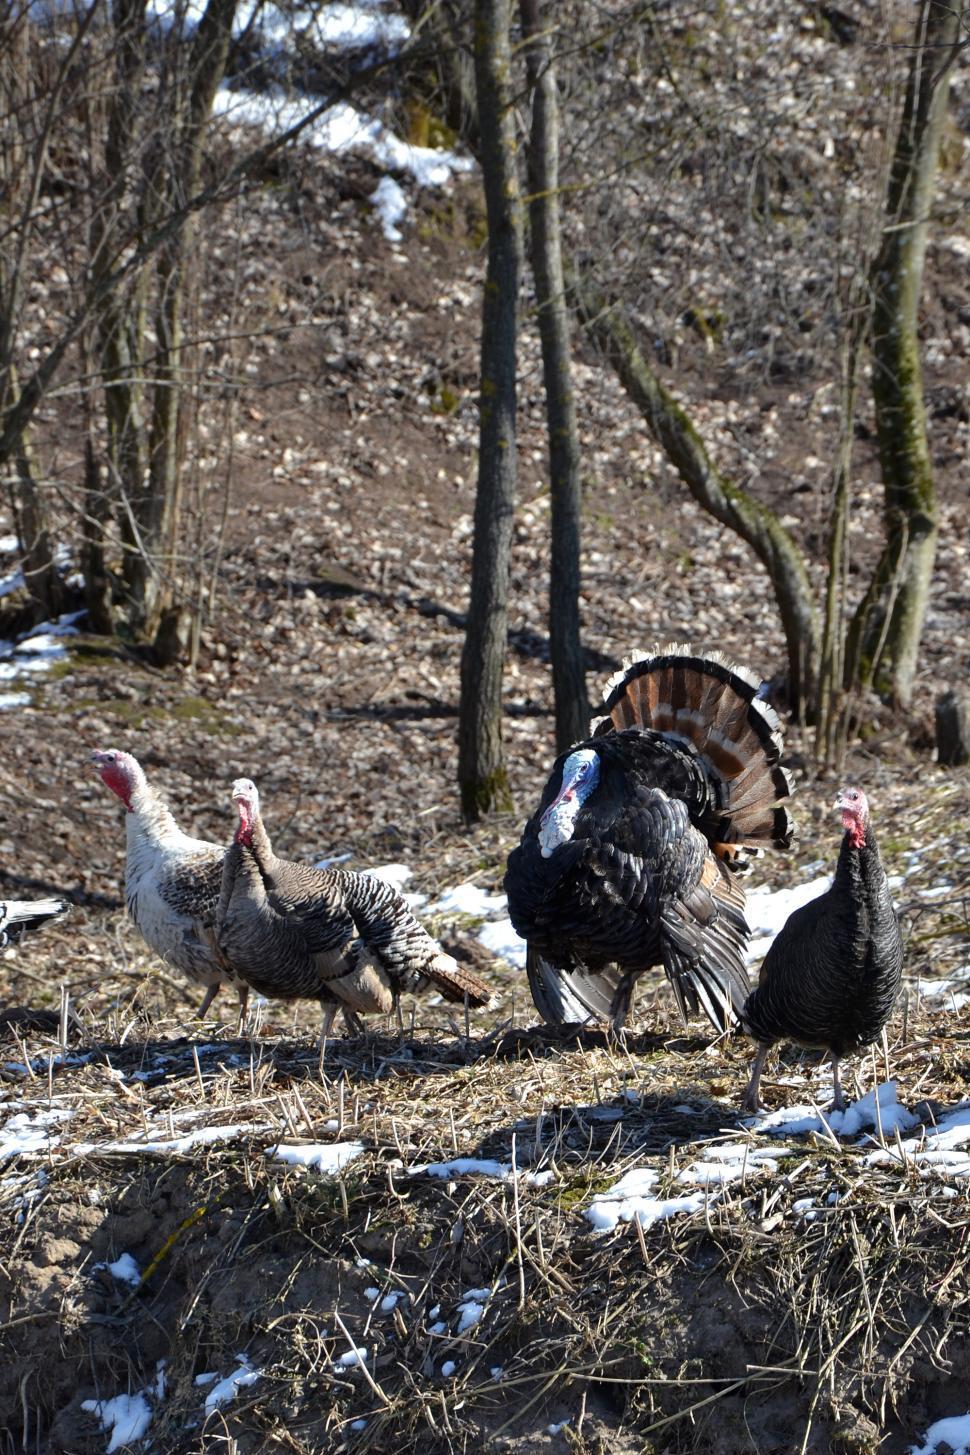 Download Free Stock HD Photo of Turkeys Online